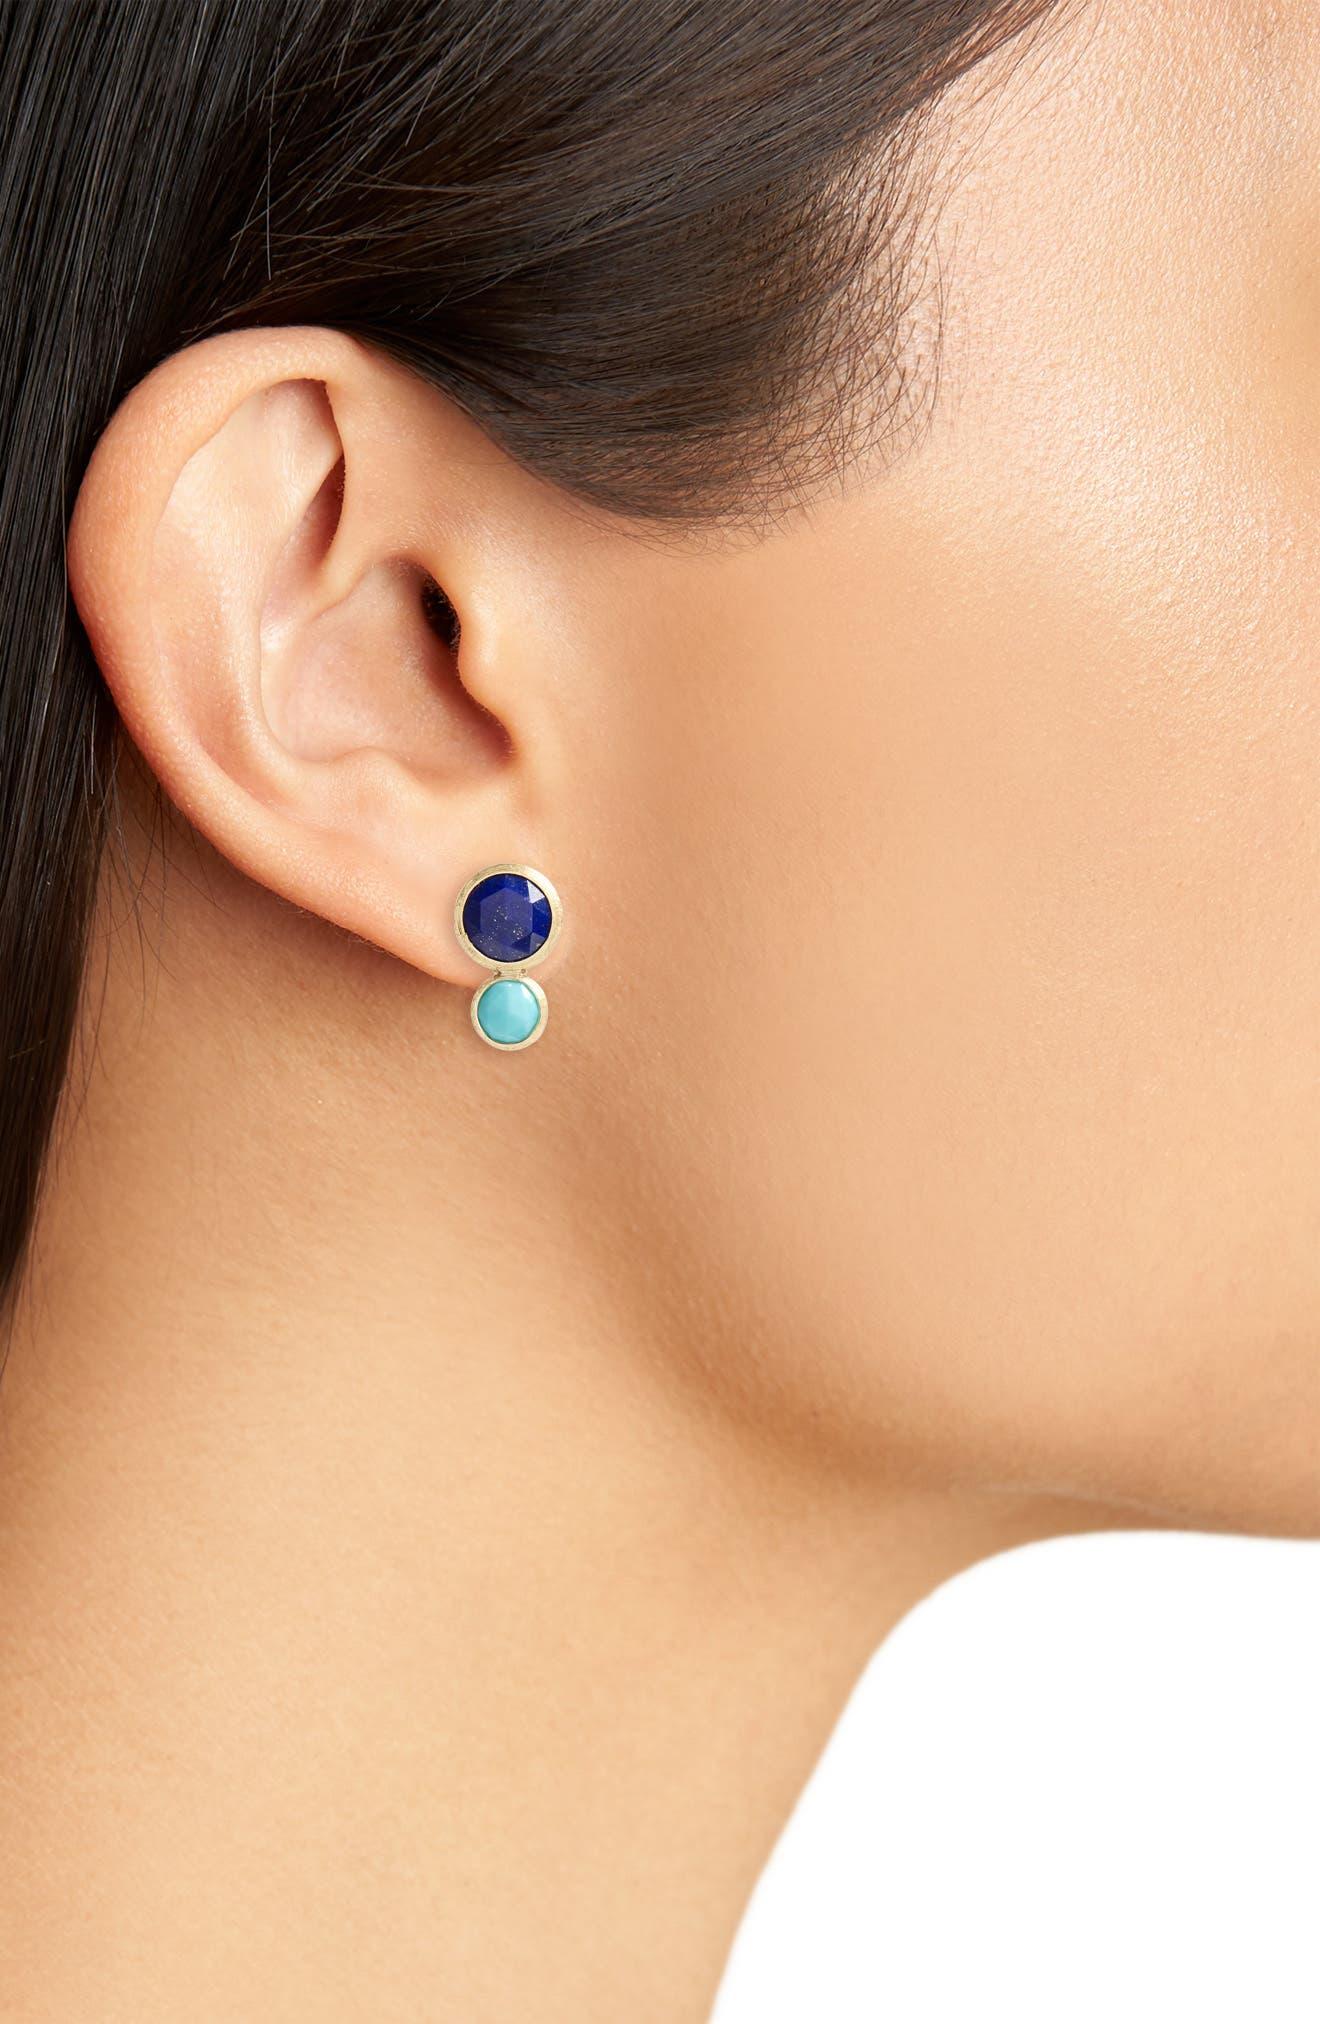 Jaipur Lapis & Turquoise Stud Earrings,                             Alternate thumbnail 2, color,                             Yellow Gold Lapis/ Turquoise